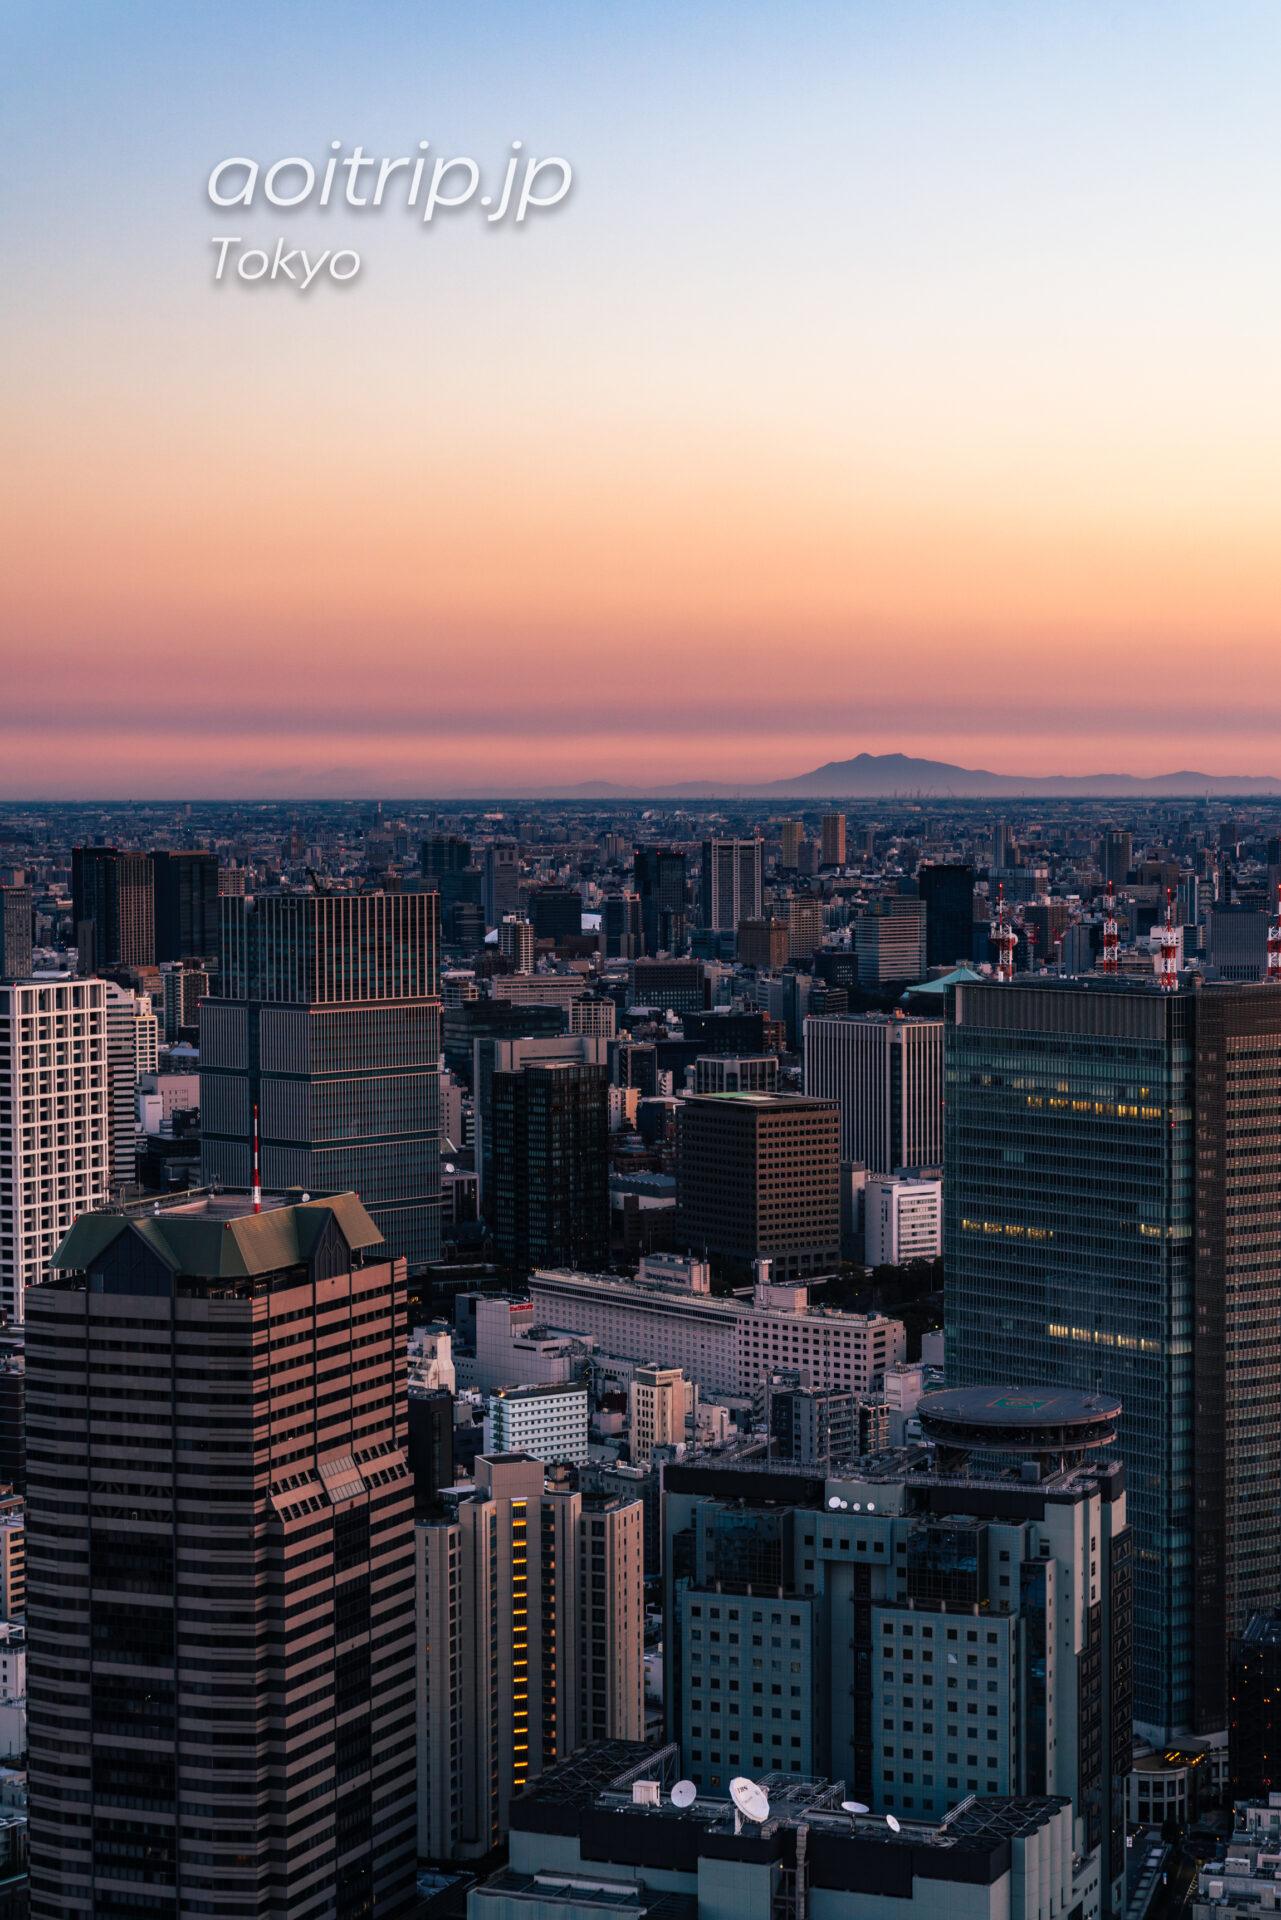 Tokyo Skyline ザ リッツカールトン東京から望む早朝の筑波山